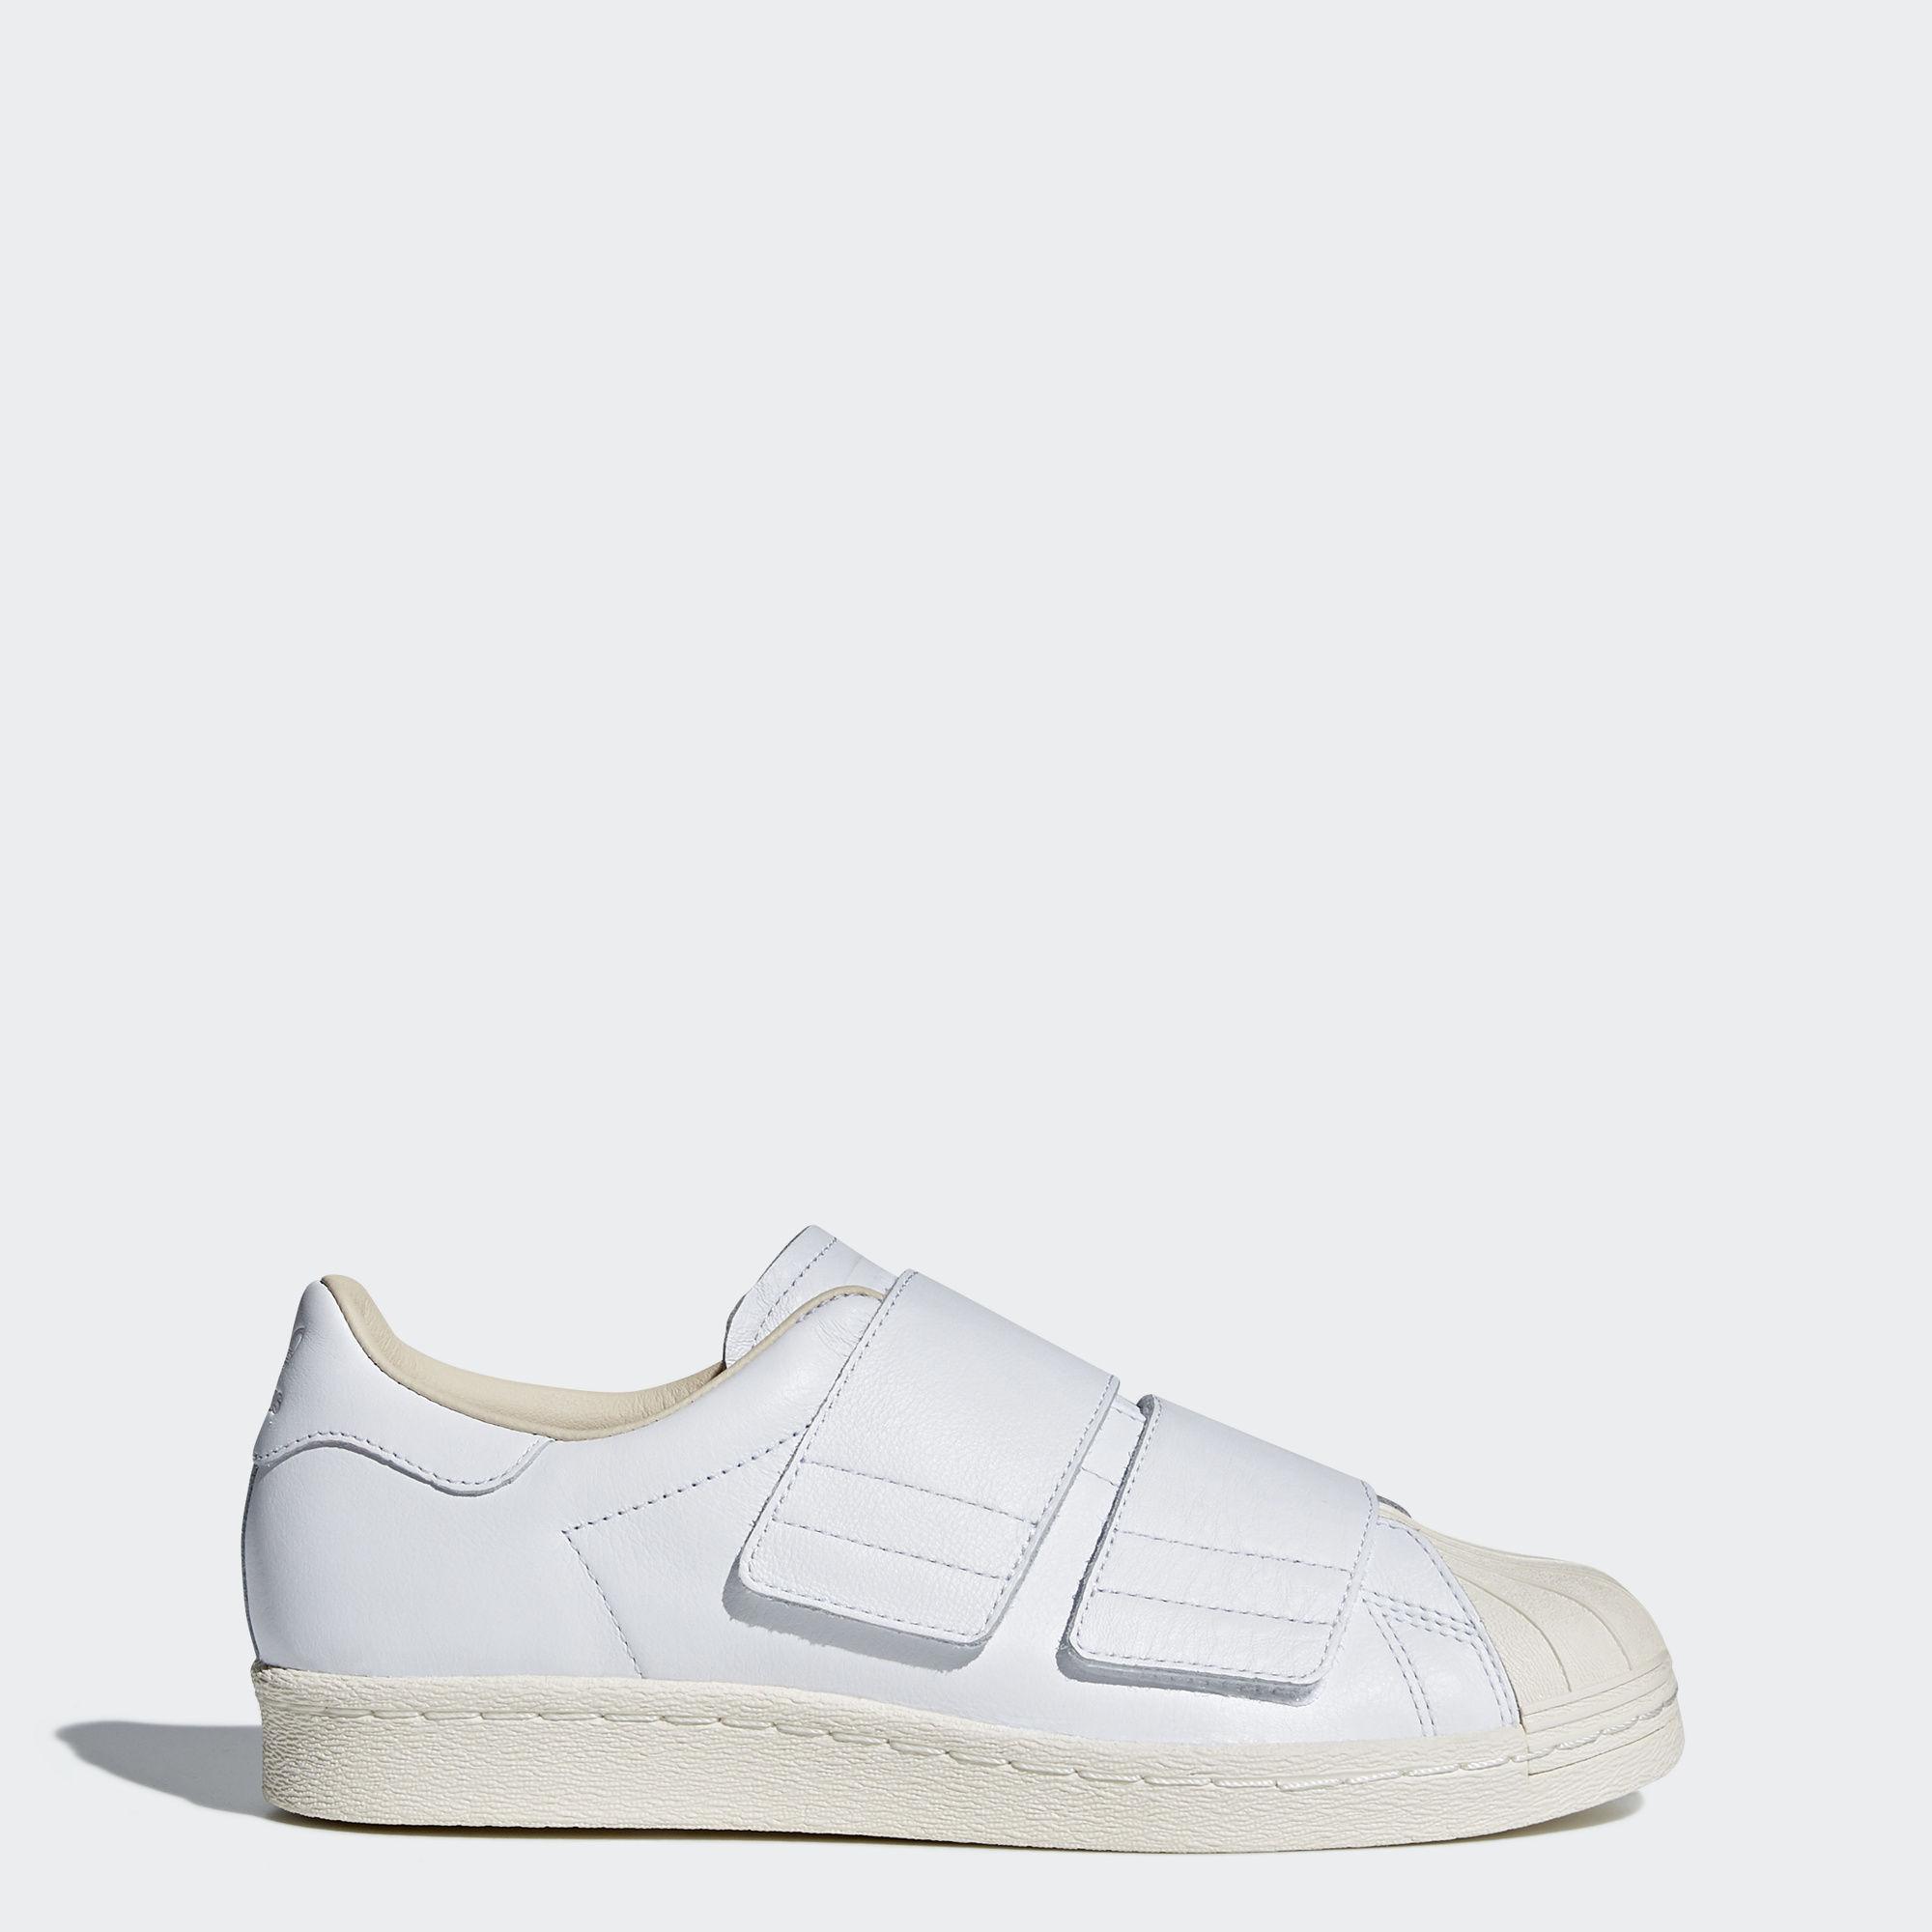 adidas original superstar femme blanche